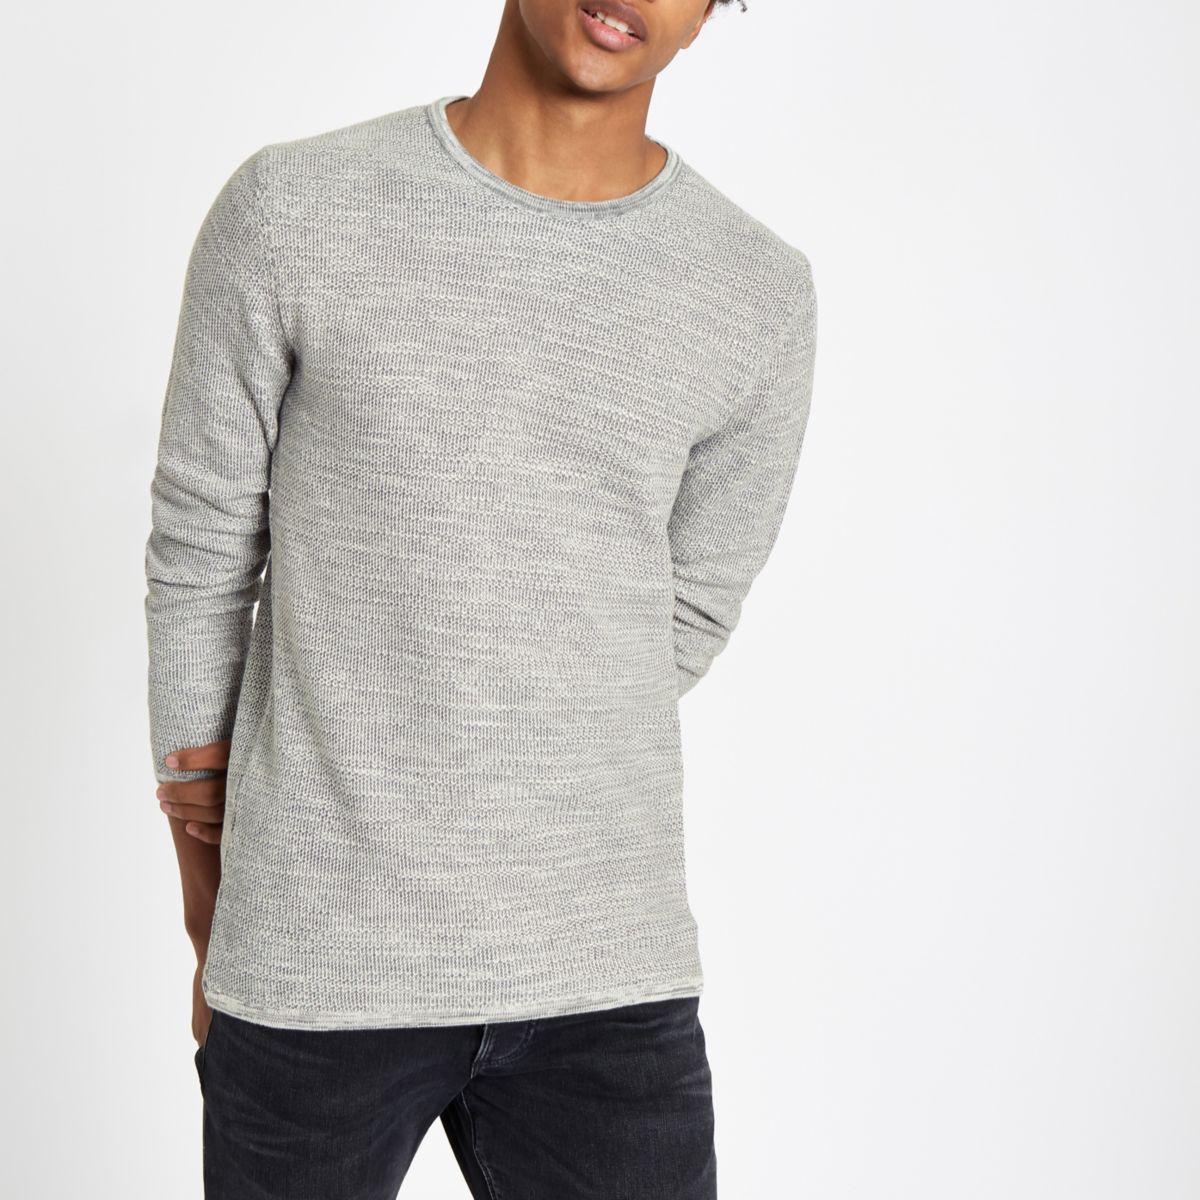 Minimum grey crew neck sweater